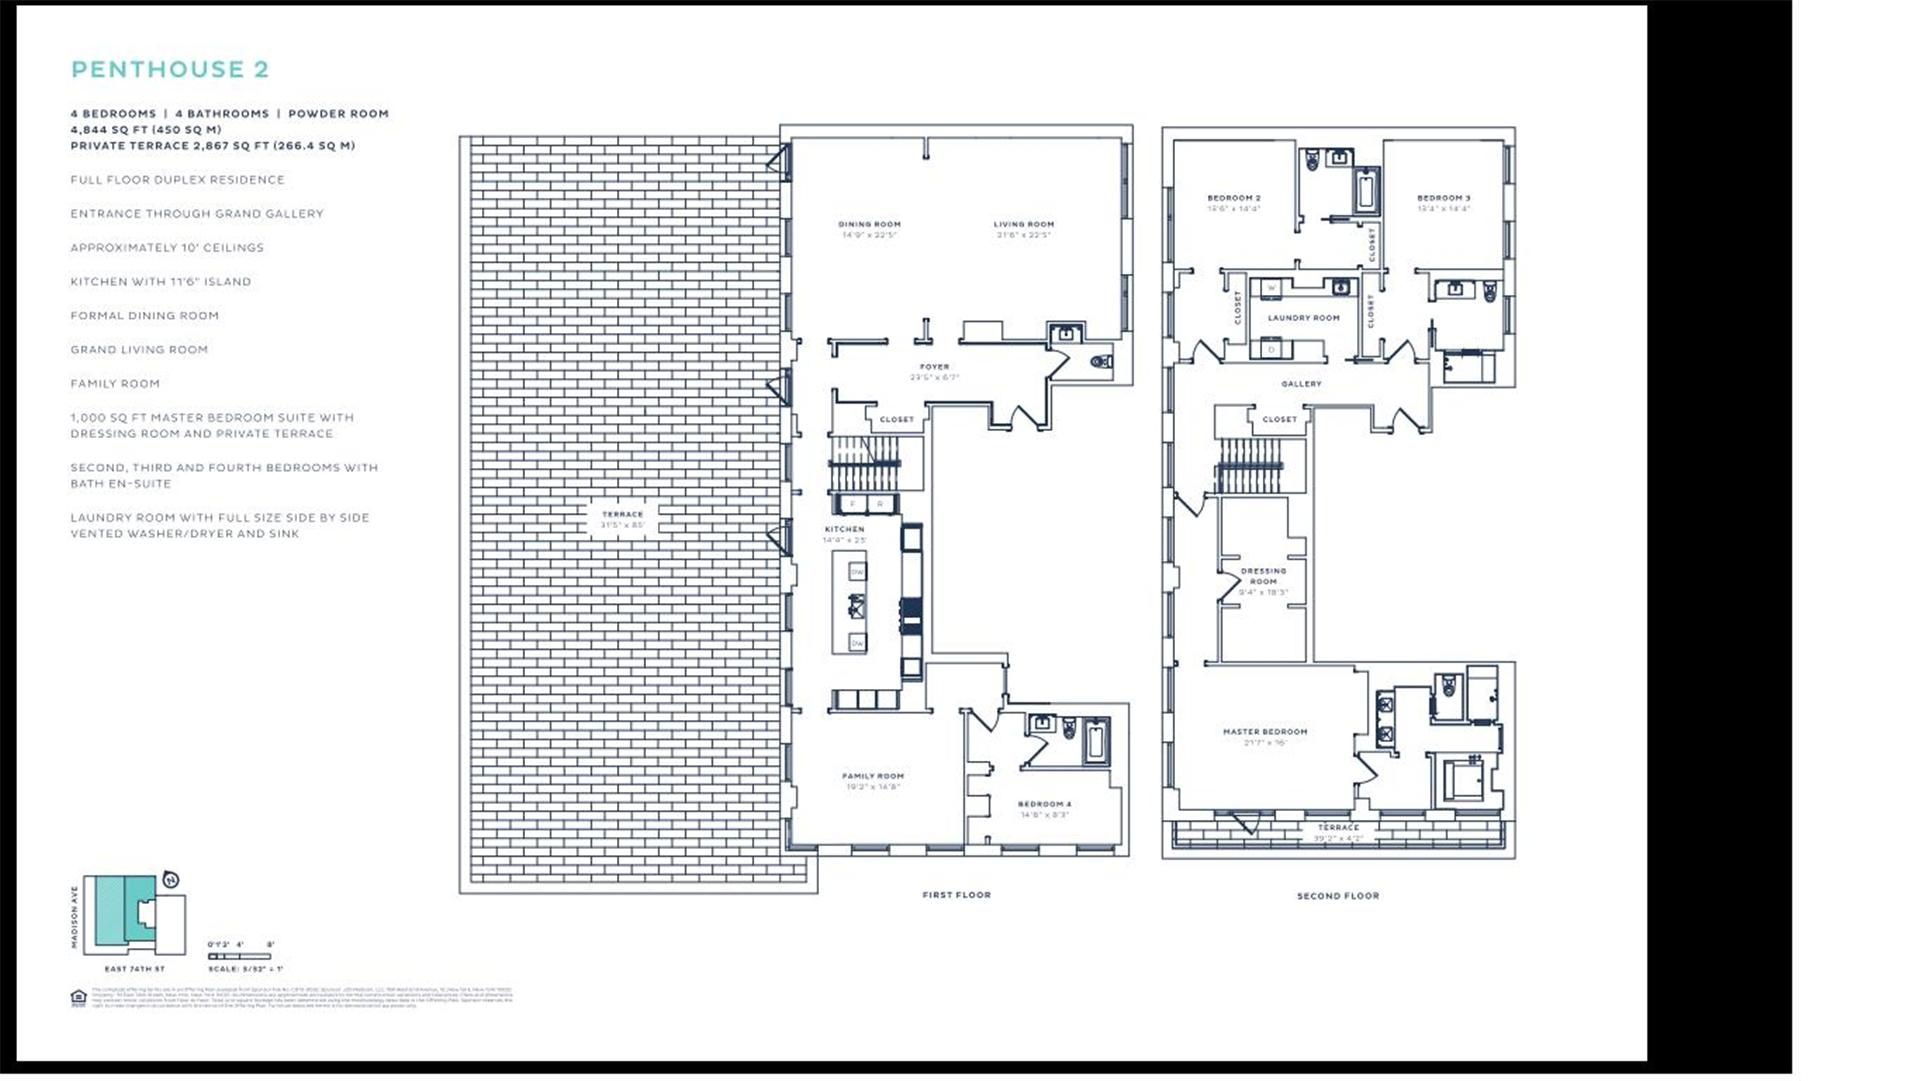 Floor plan of 33 East 74th Street, 33 East 74th St, PH2 - Upper East Side, New York